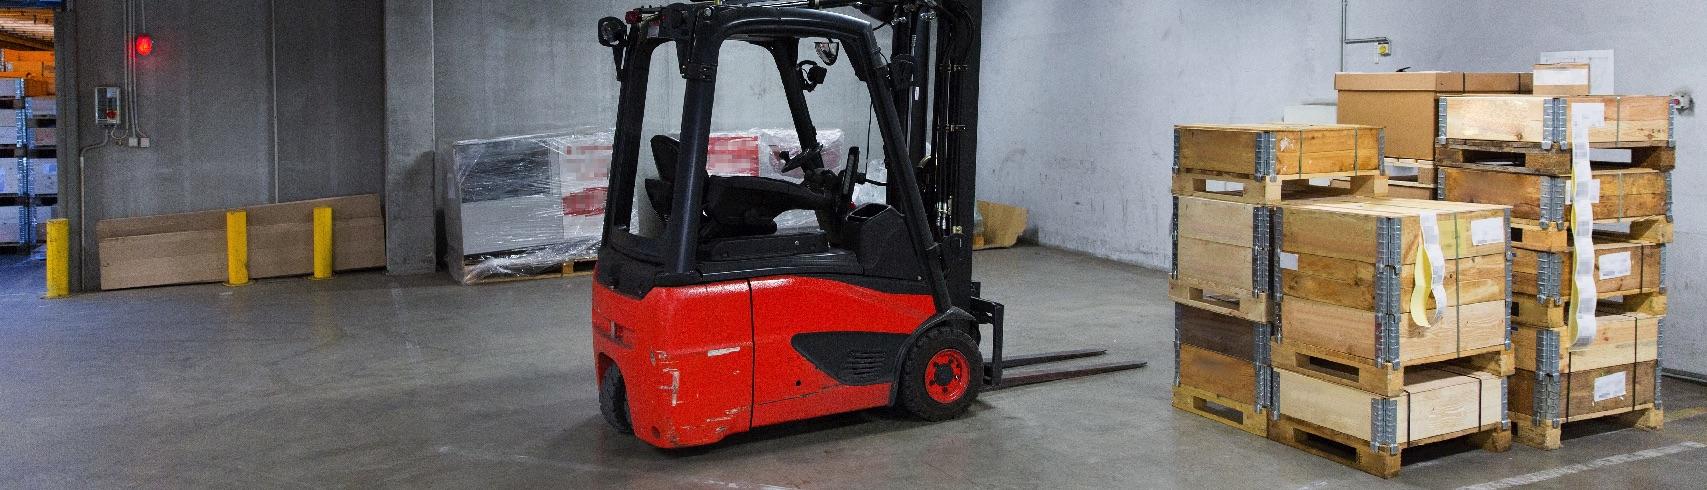 Forklift & Telehandler Rental   NYC